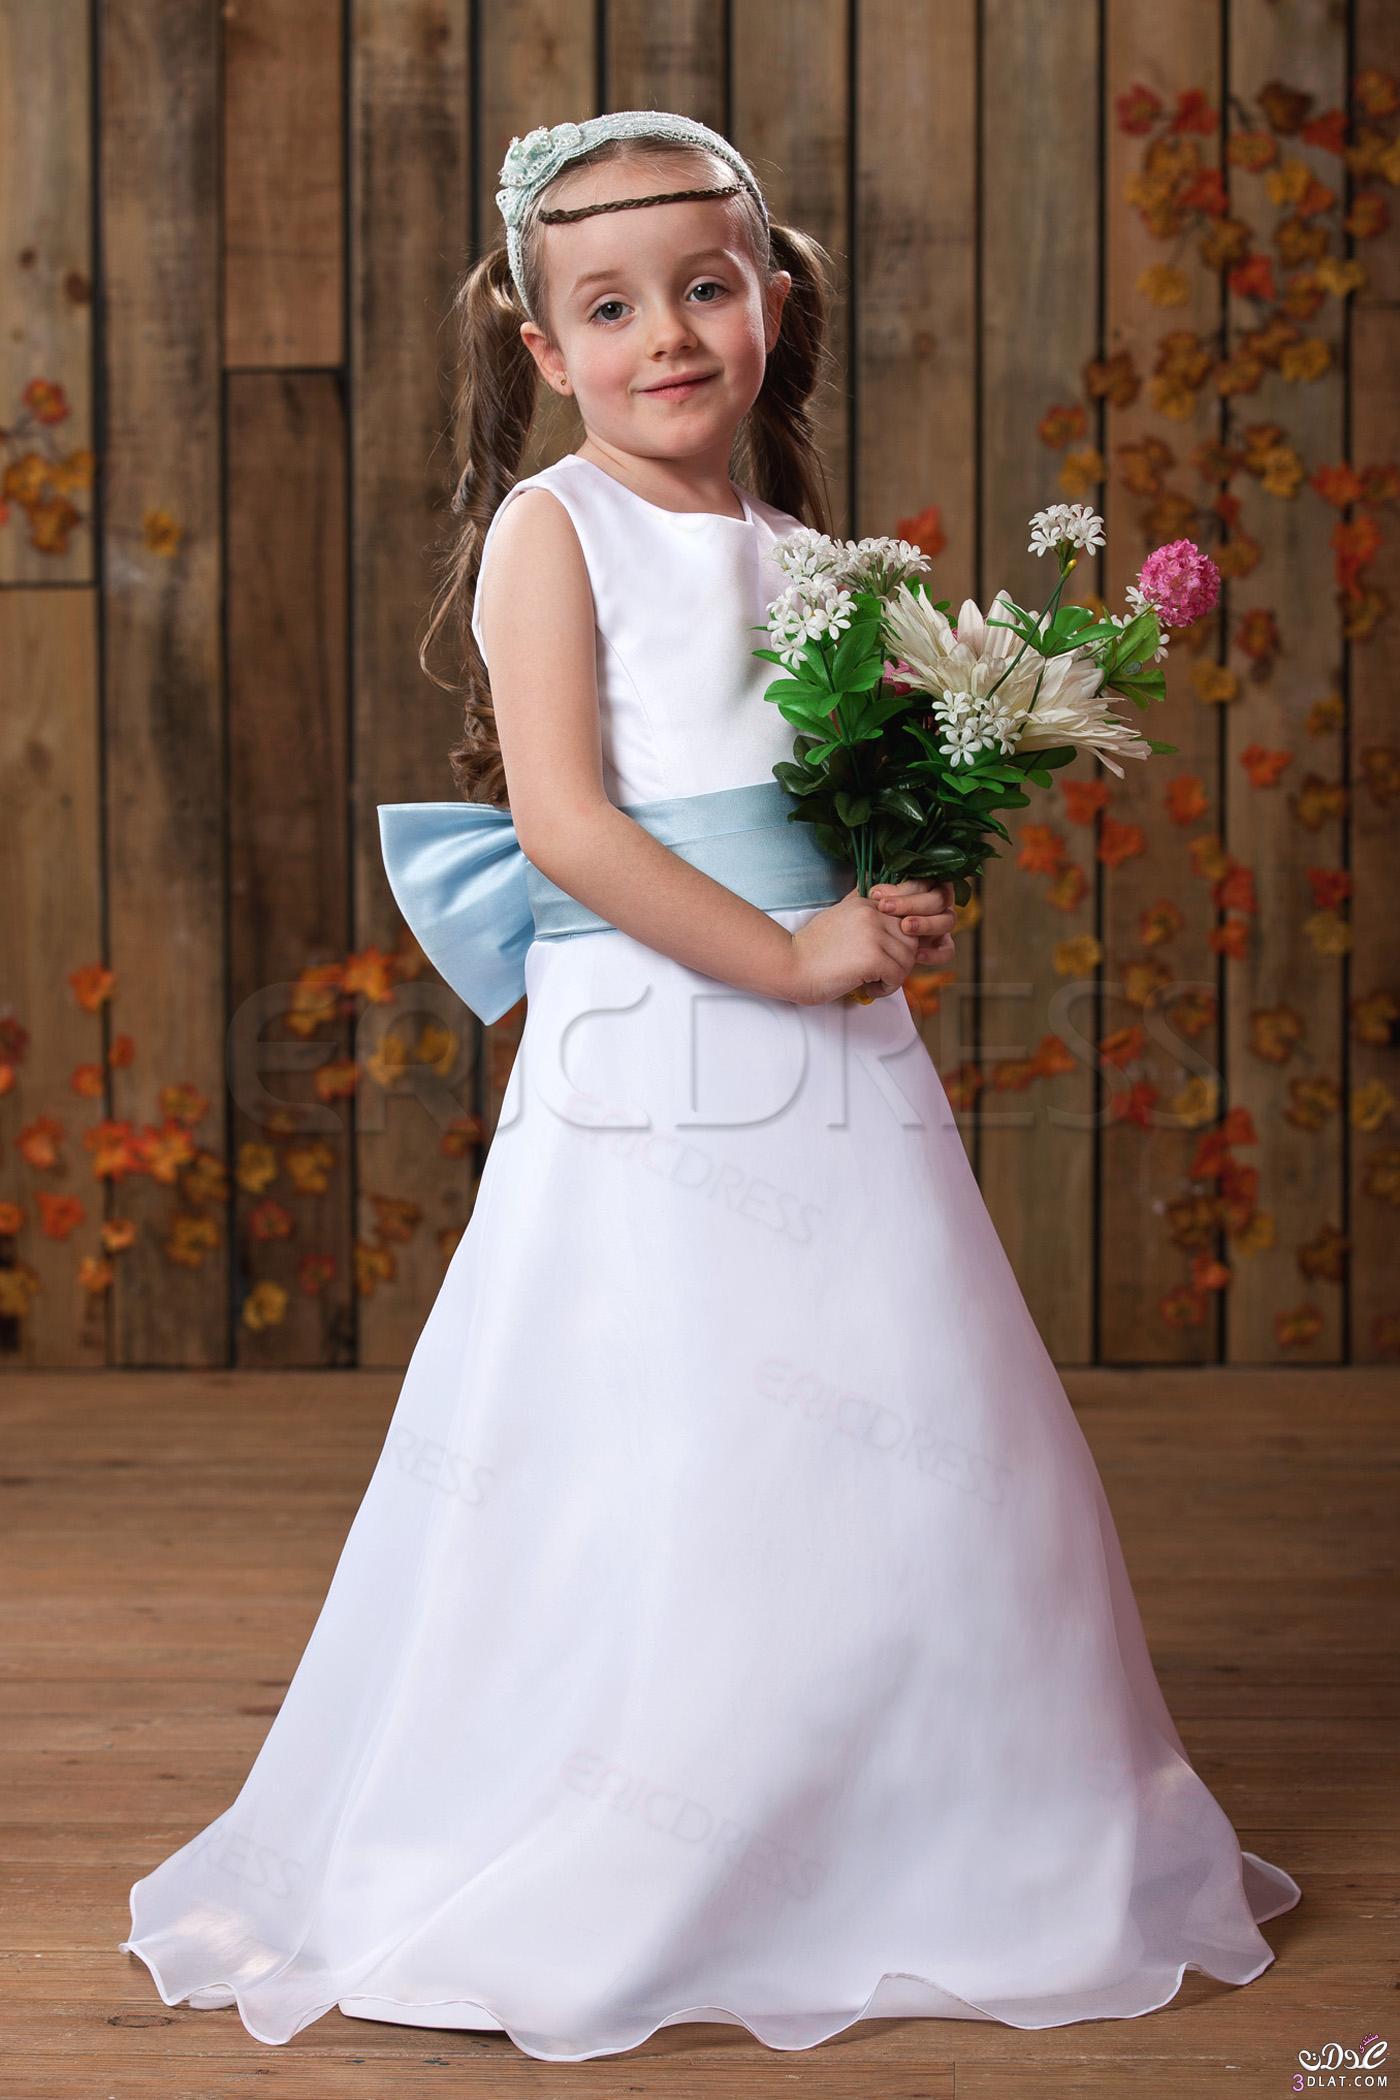 655d57da9 فساتين بناتي منفوشة للافراح والمناسبات 2020,اجمل فساتين الحفلات والاعراس  للبنات